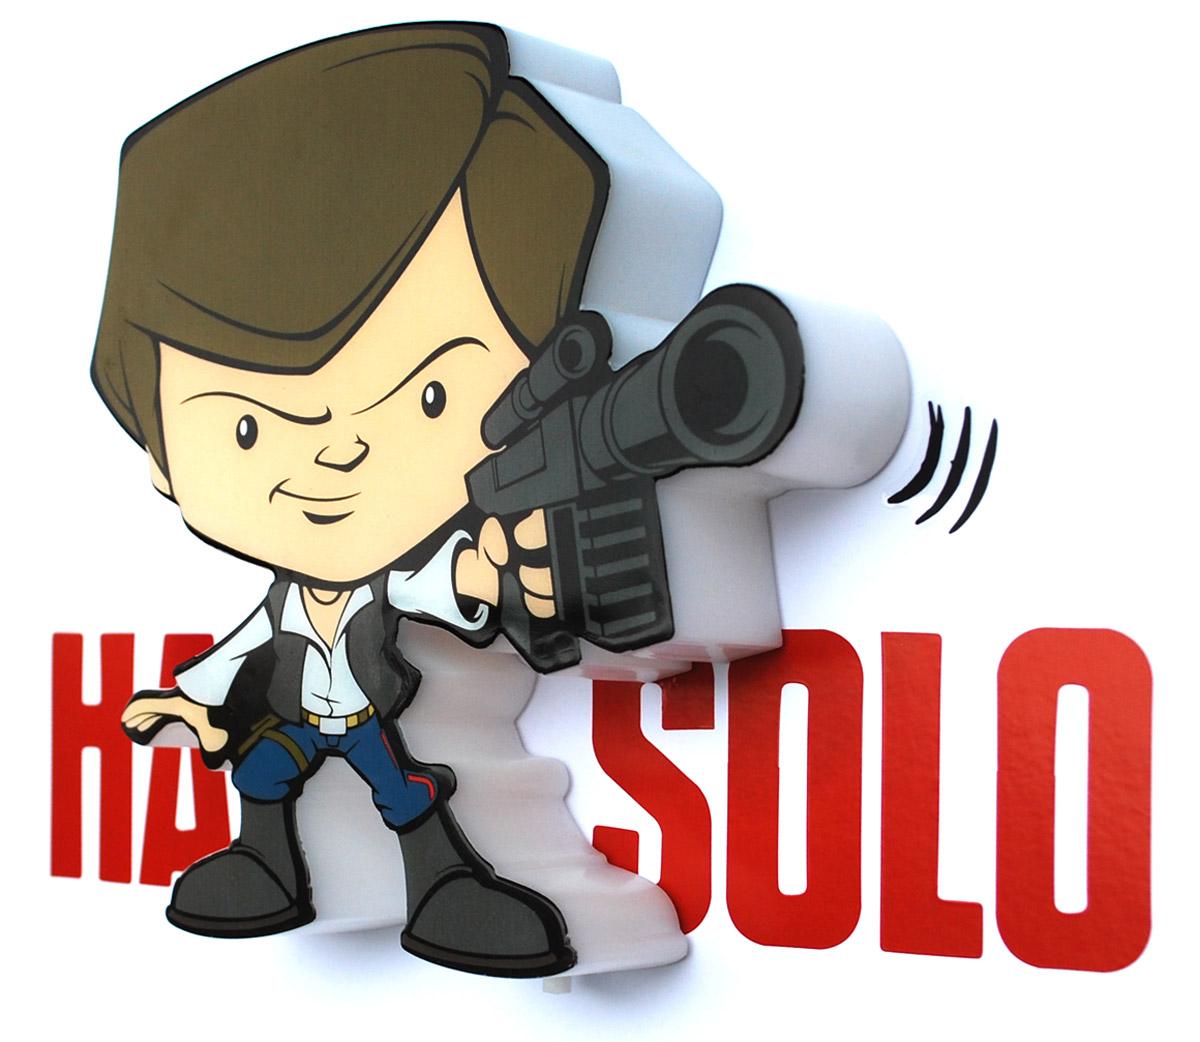 Star Wars Пробивной 3D мини-светильник Хан Соло minions пробивной 3d мини светильник боб